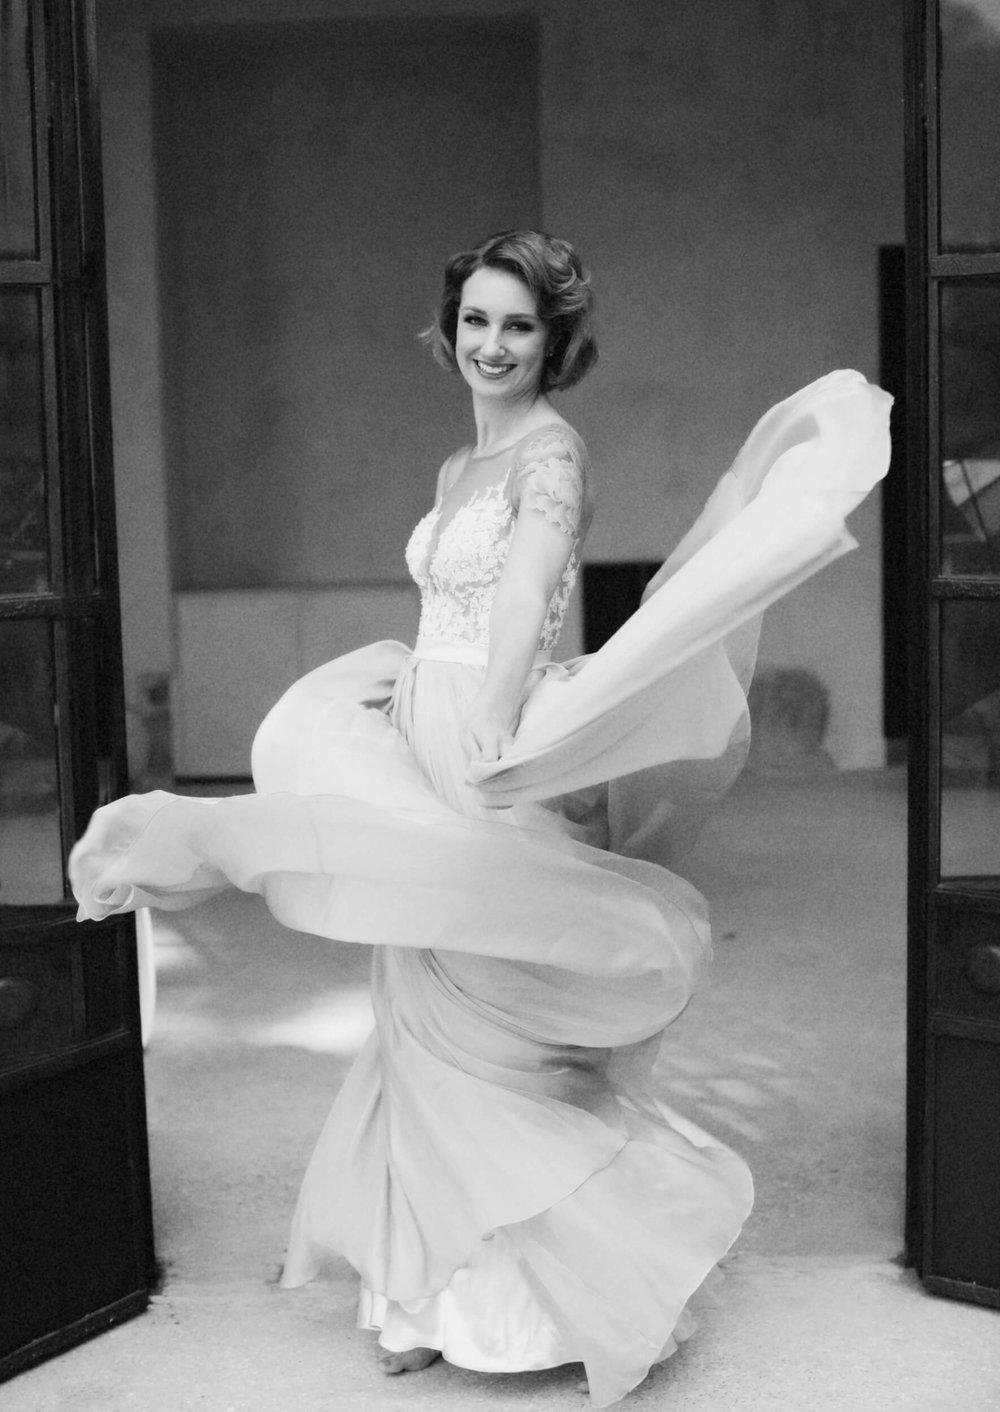 Portrait of lady dancing in dress swirling around her body